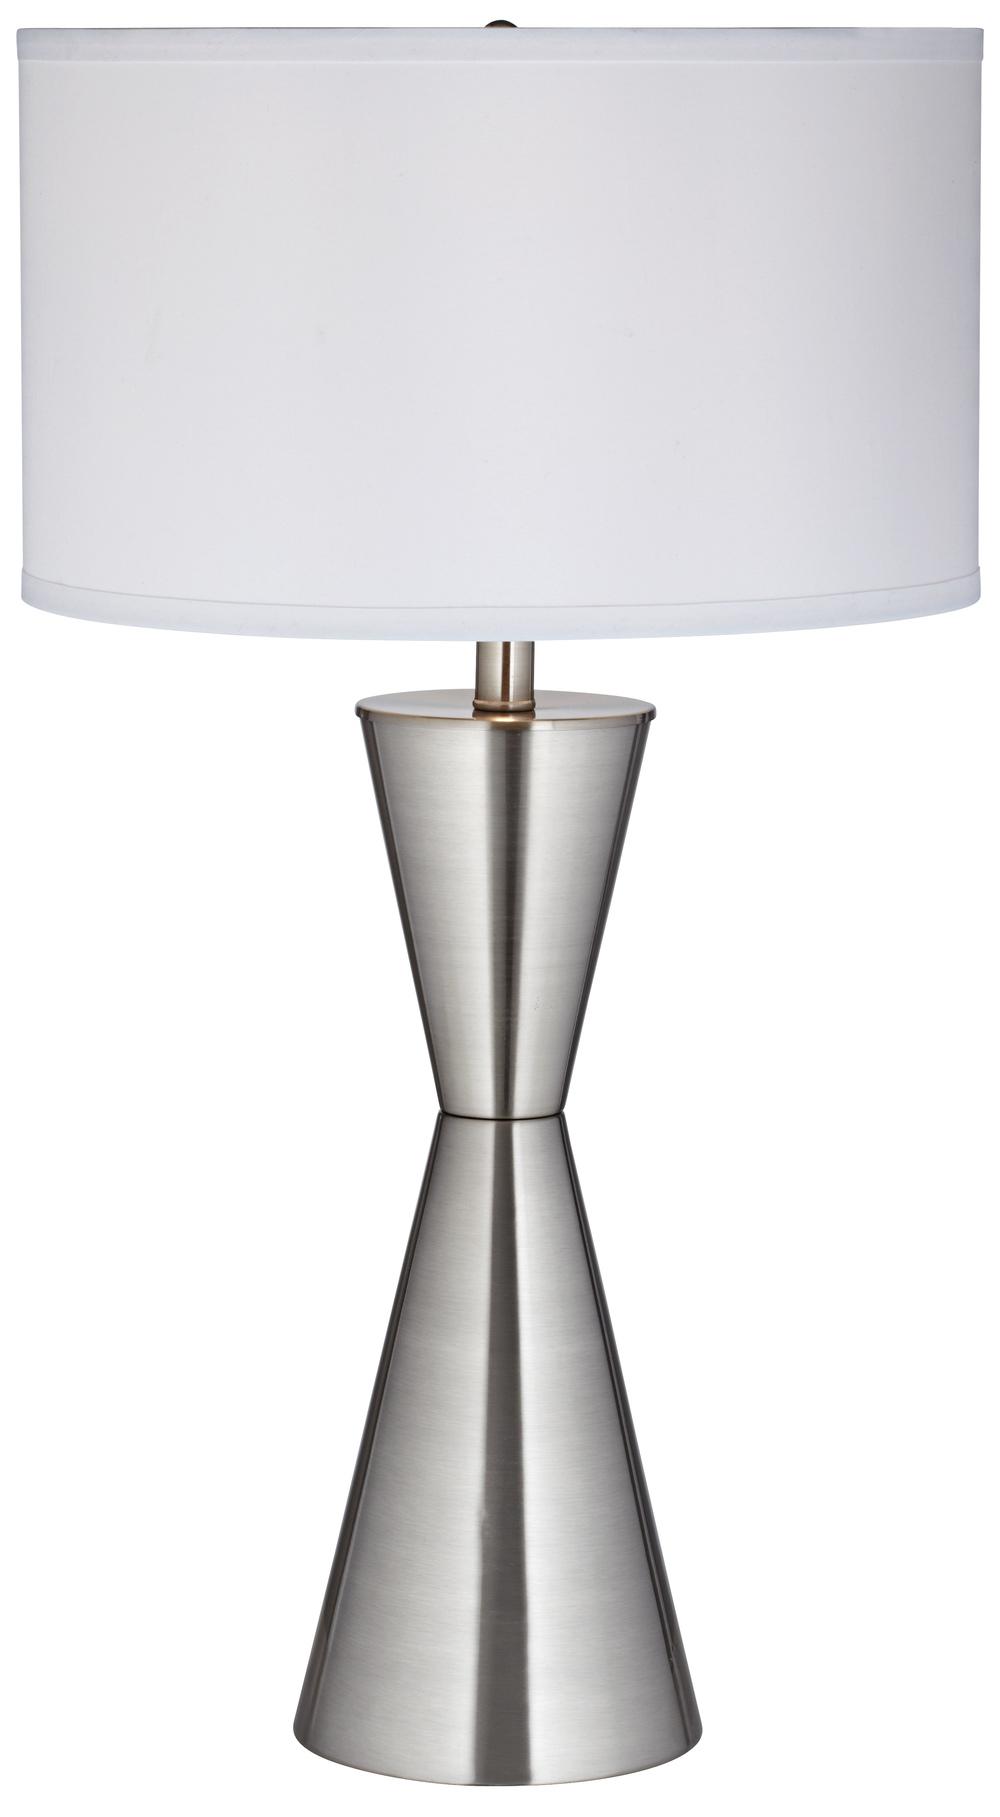 Pacific Coast Lighting - Troubadour Table Lamp